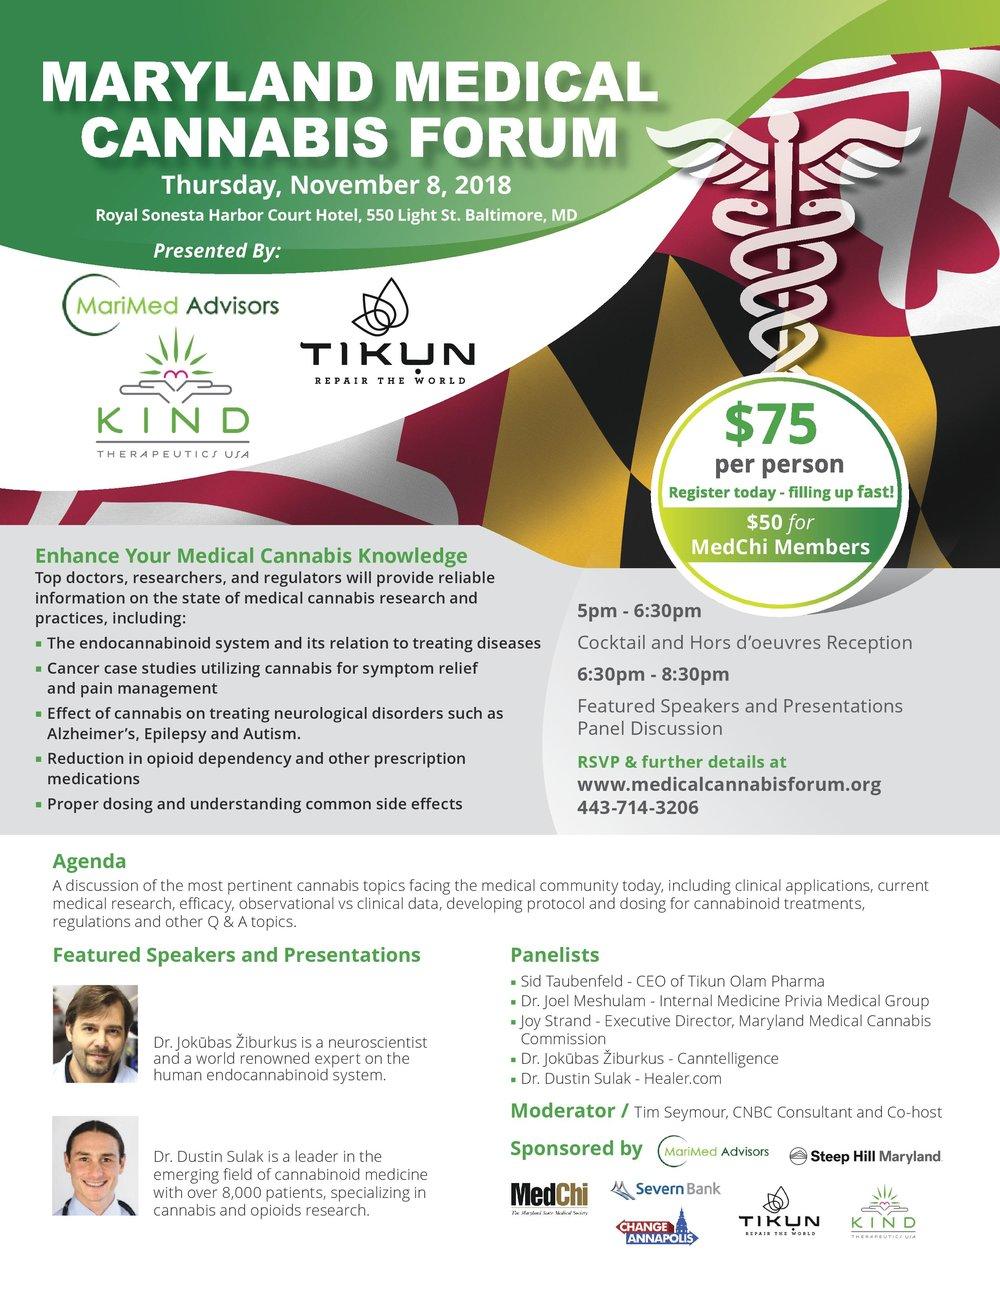 nologos-Maryland-Medical-Cannabis-Forum-FILE13-page-001.jpg